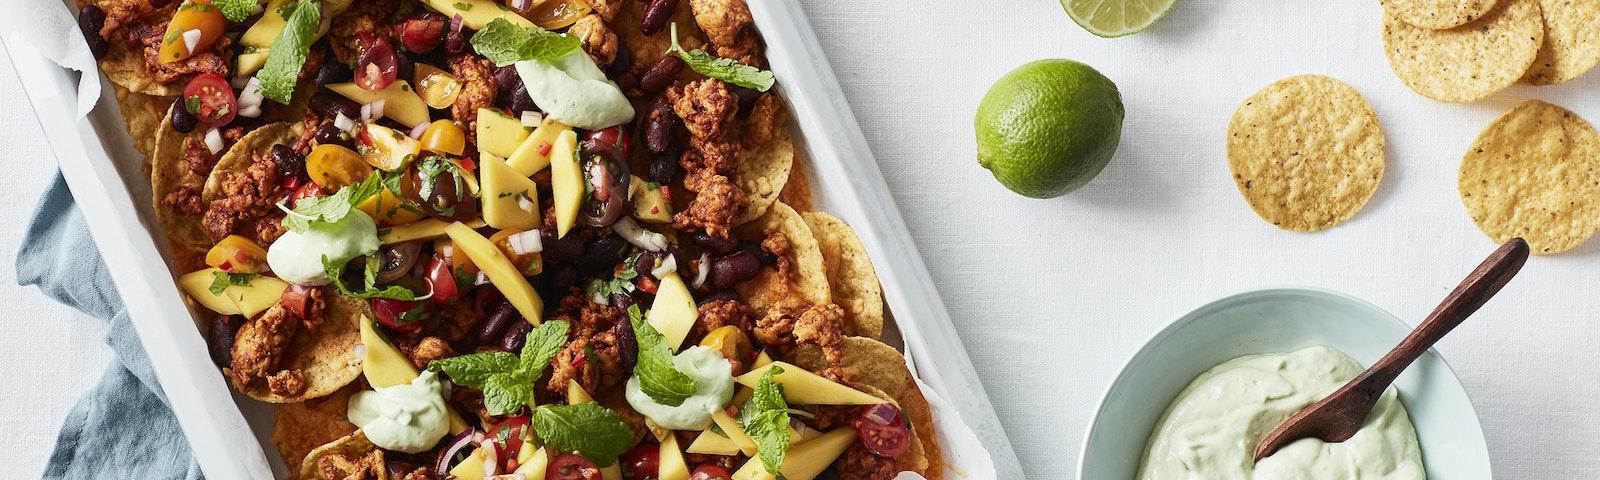 Nachos med krydret kylling, mangosalsa & avocadocreme